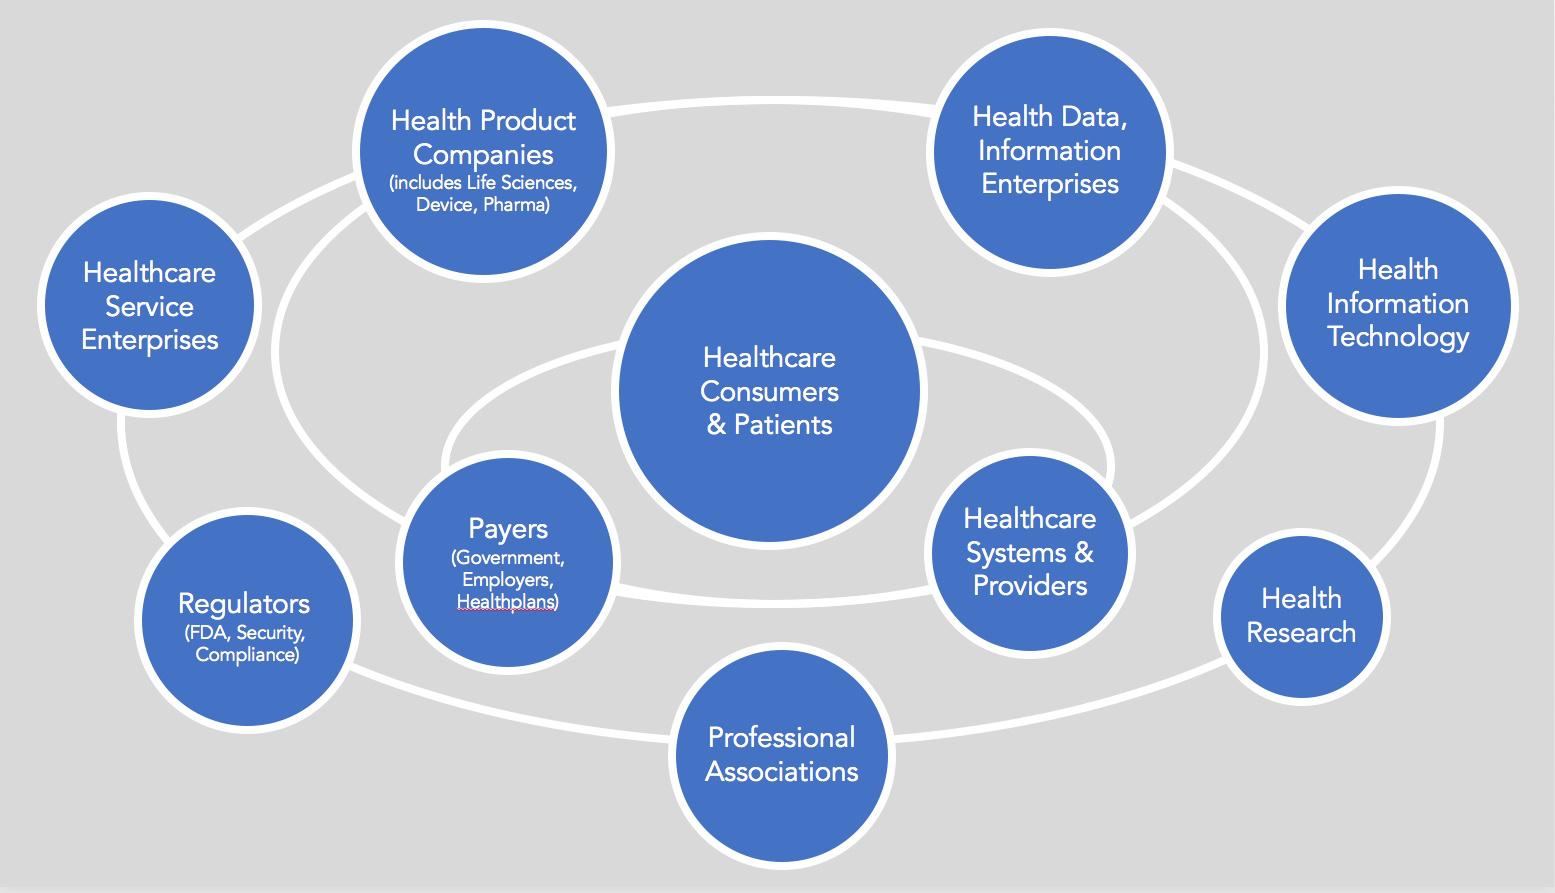 Healthcare Segments